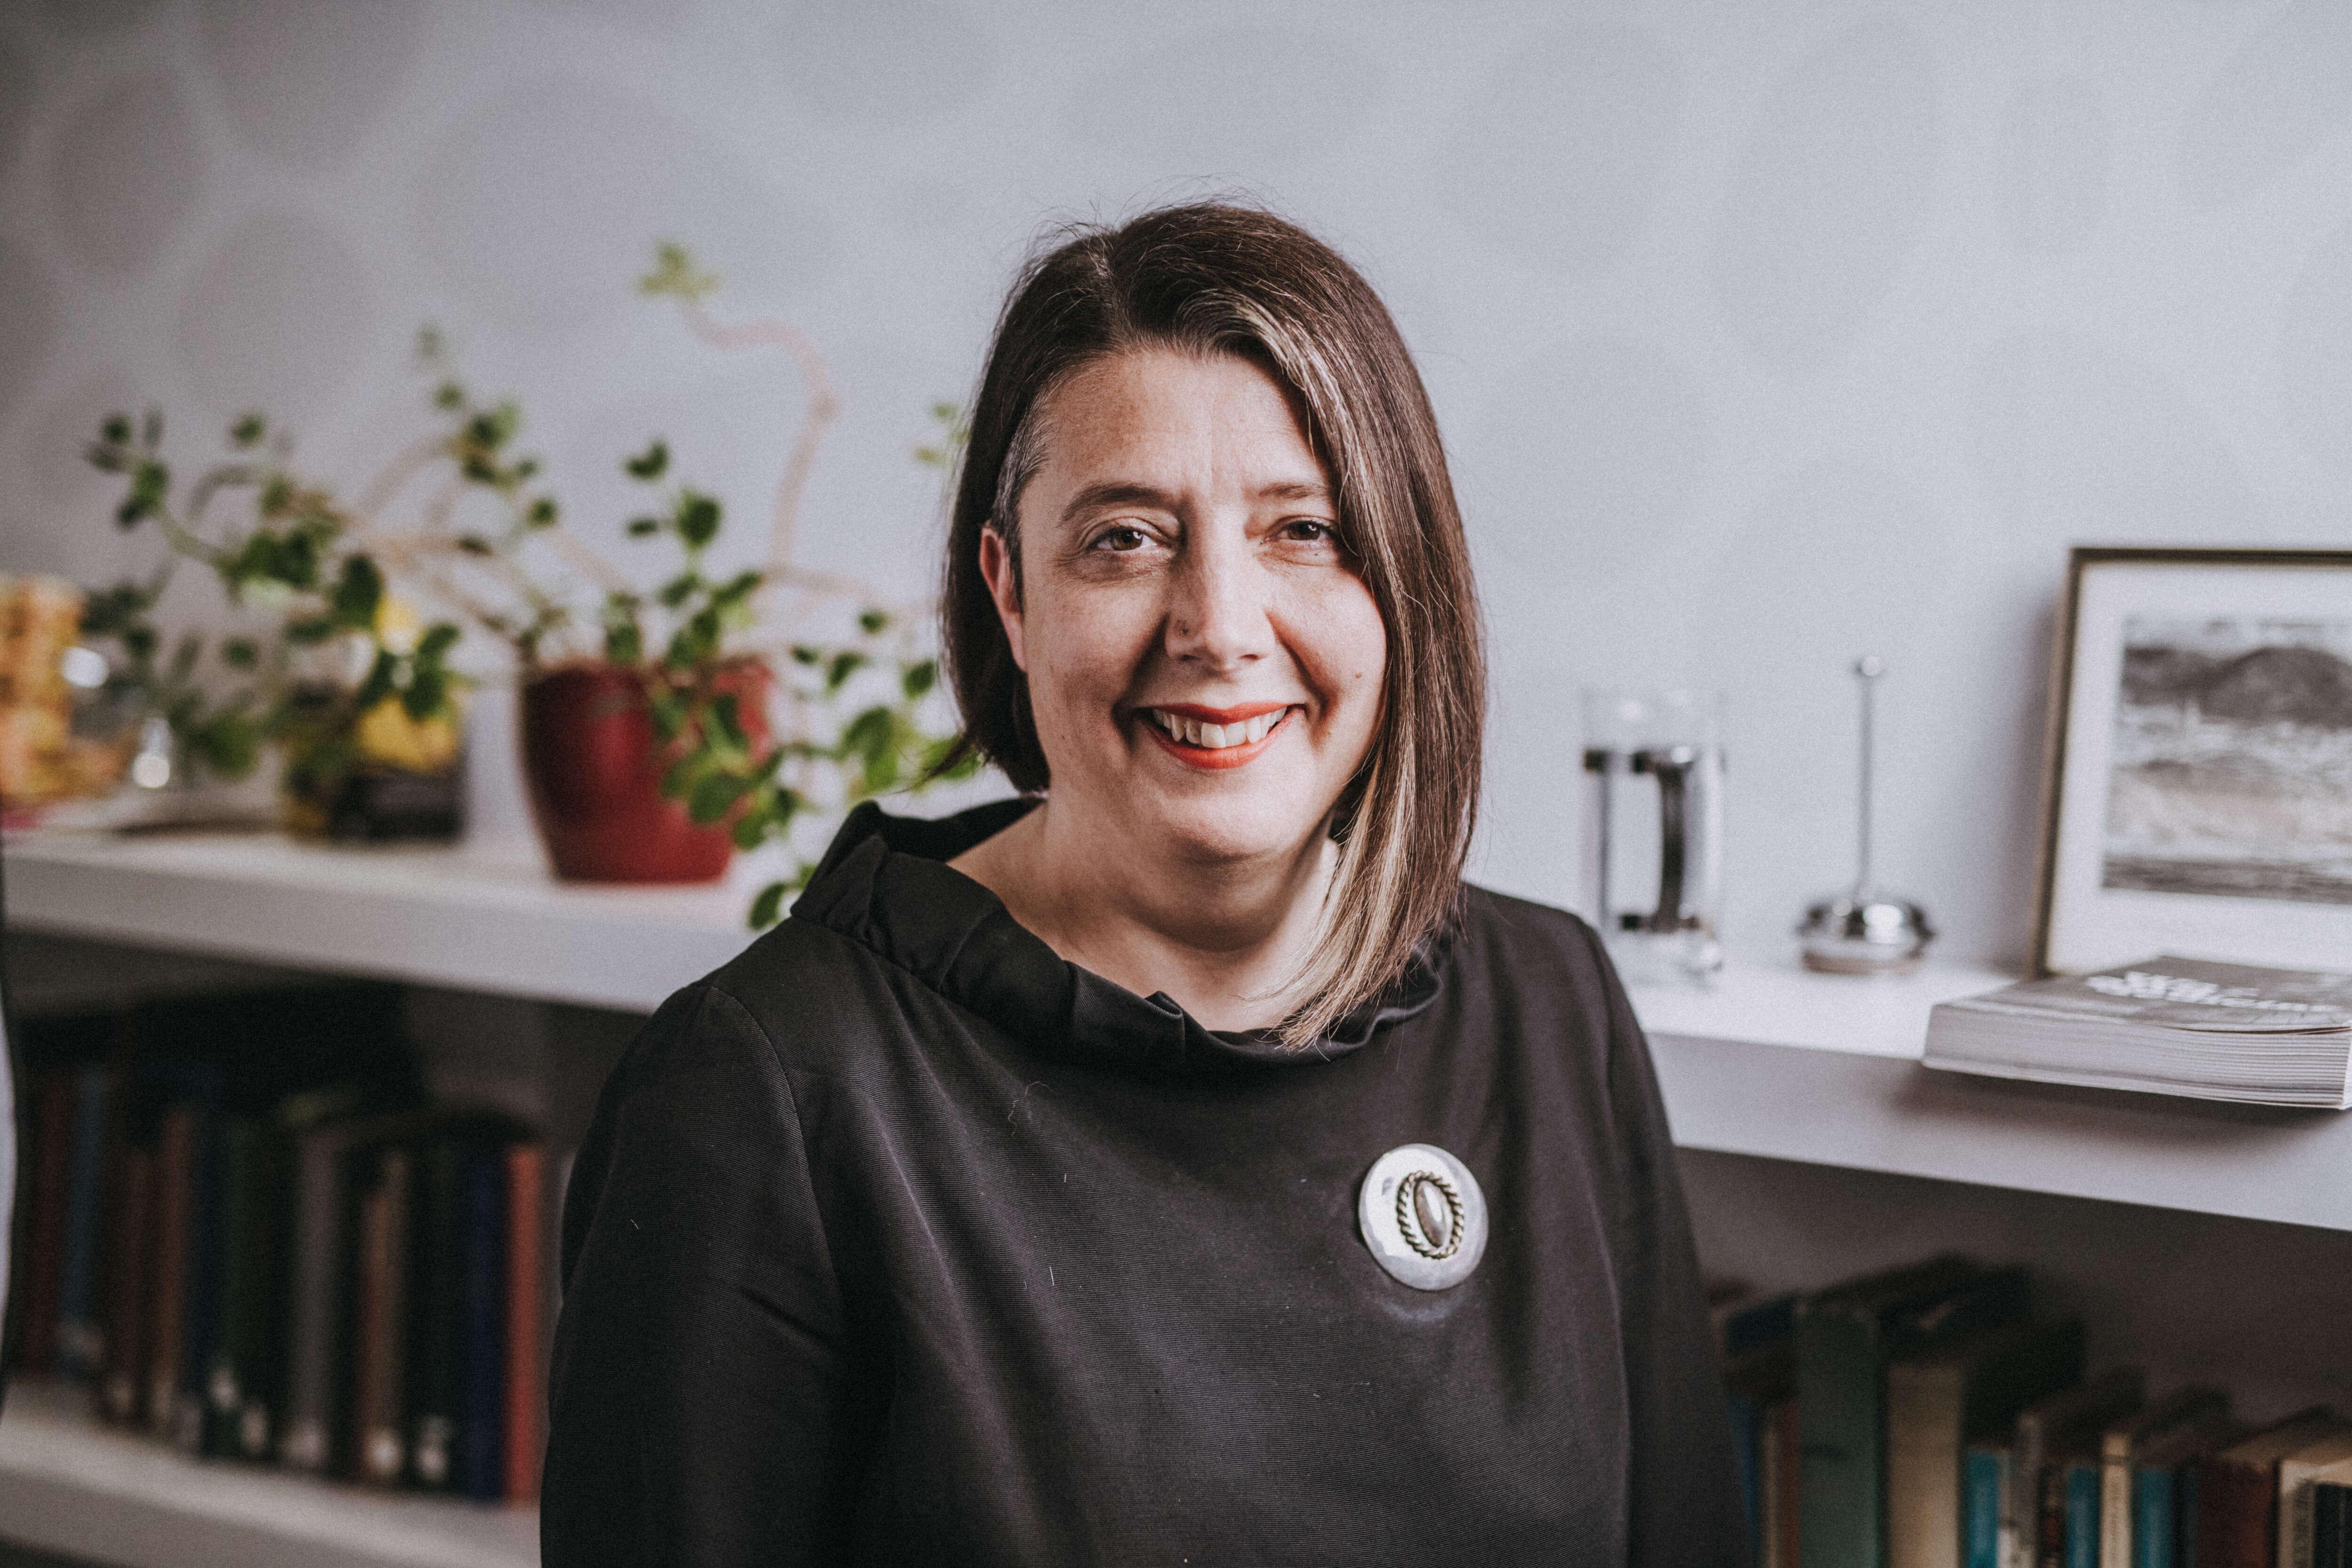 Profile image - Laura Salisbury